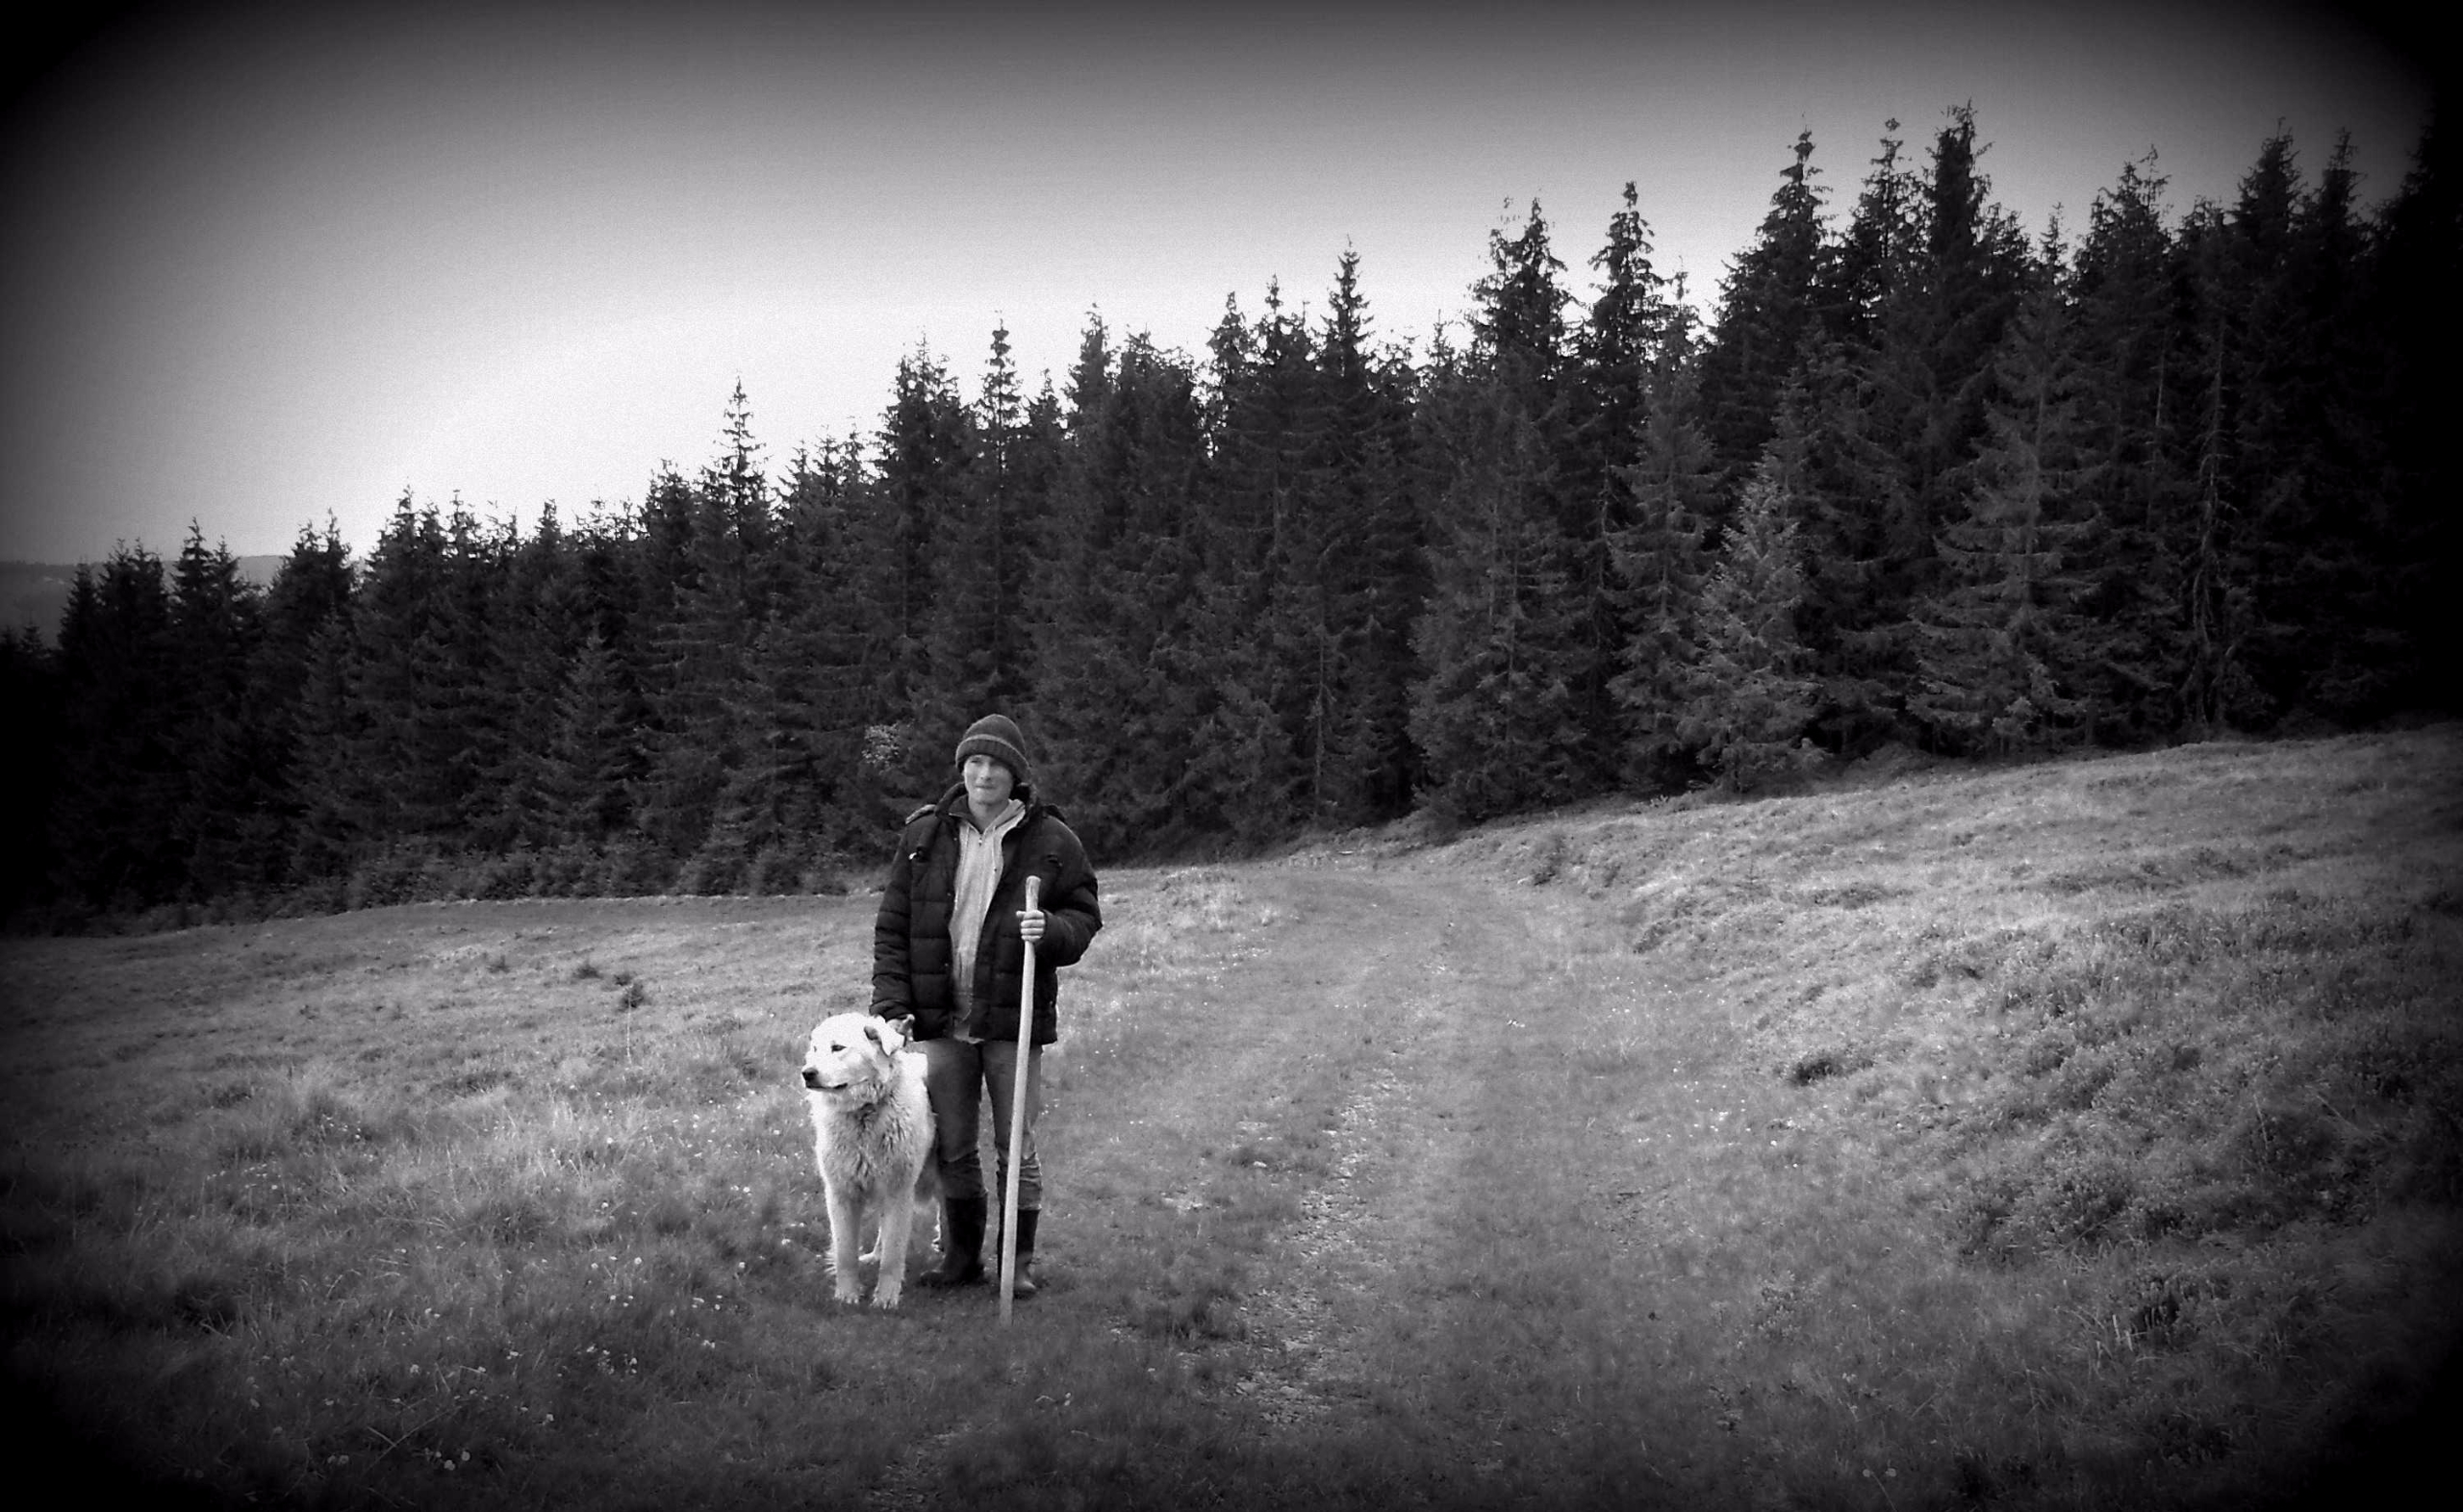 Shepherd dog, common epitome Hu - fondator | ello